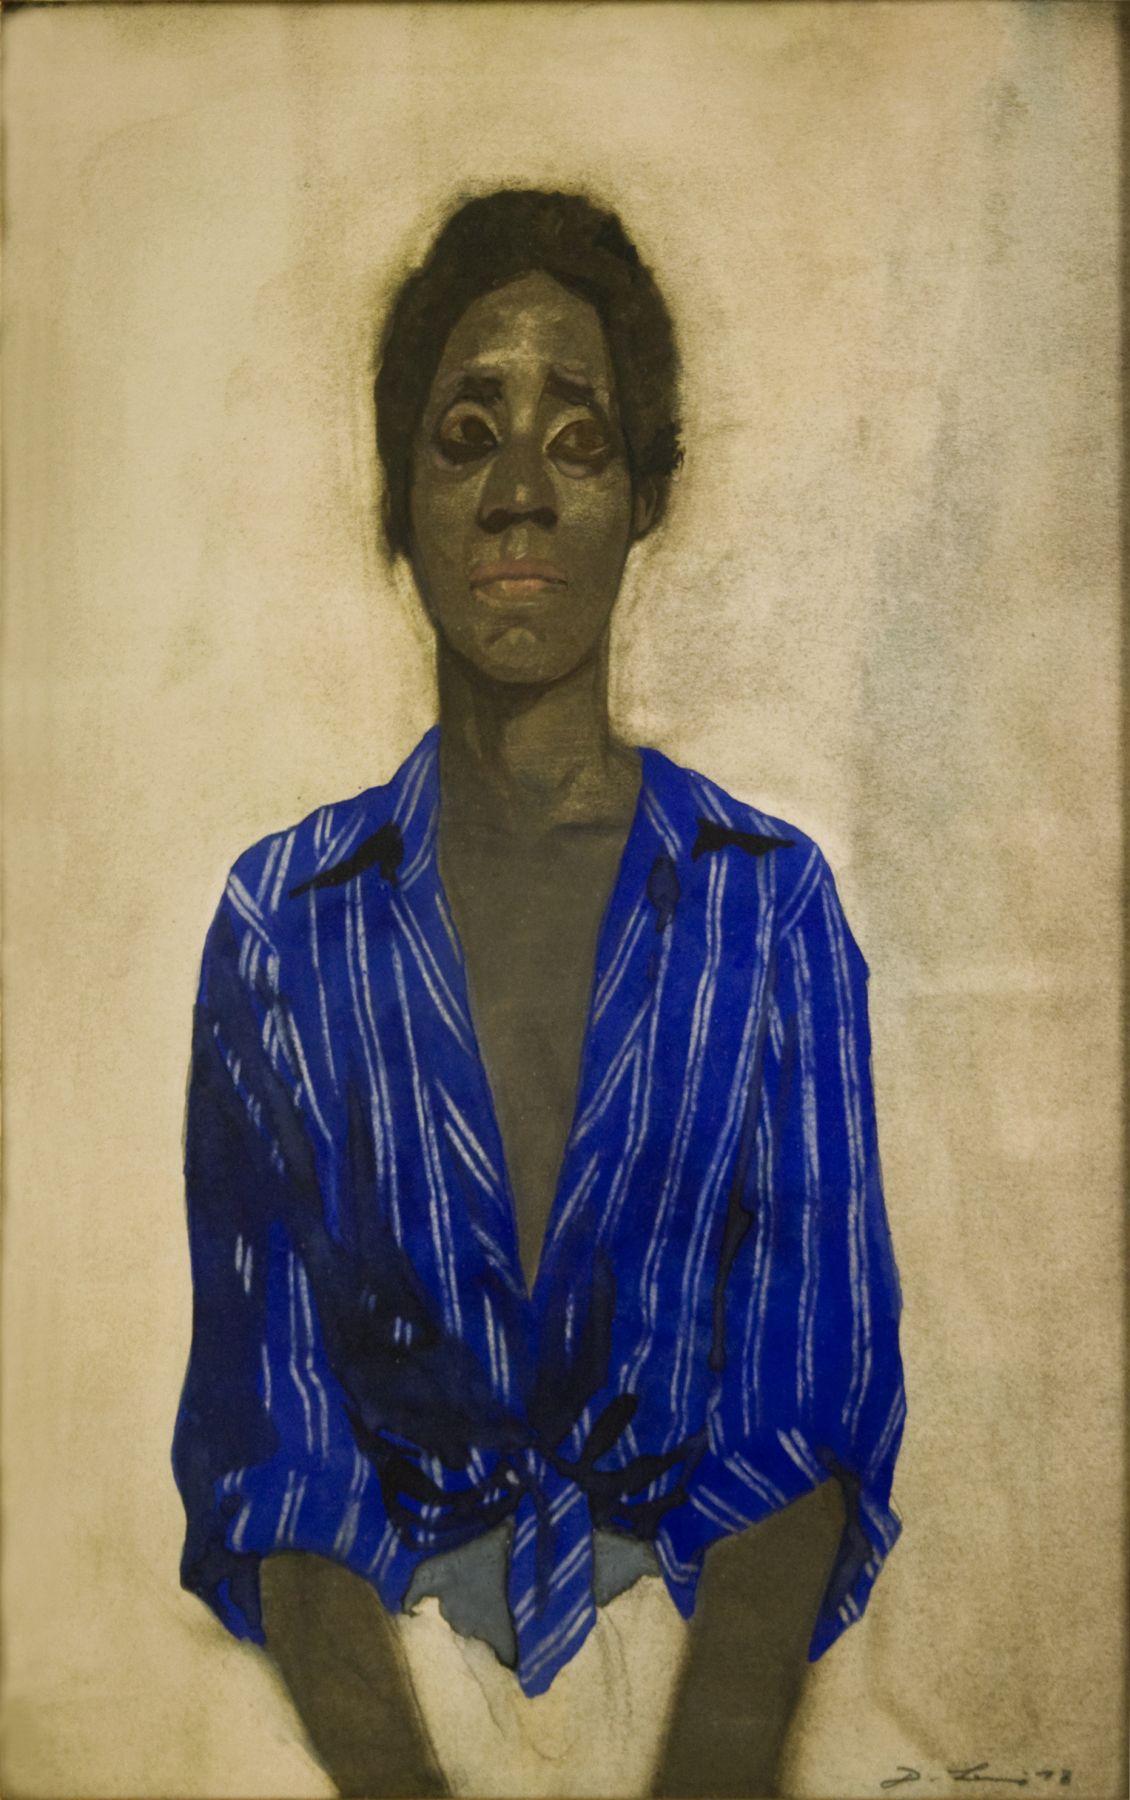 David Levine, Black and Blue, 1978, watercolor, 14 1/2 x 9 1/4 inches